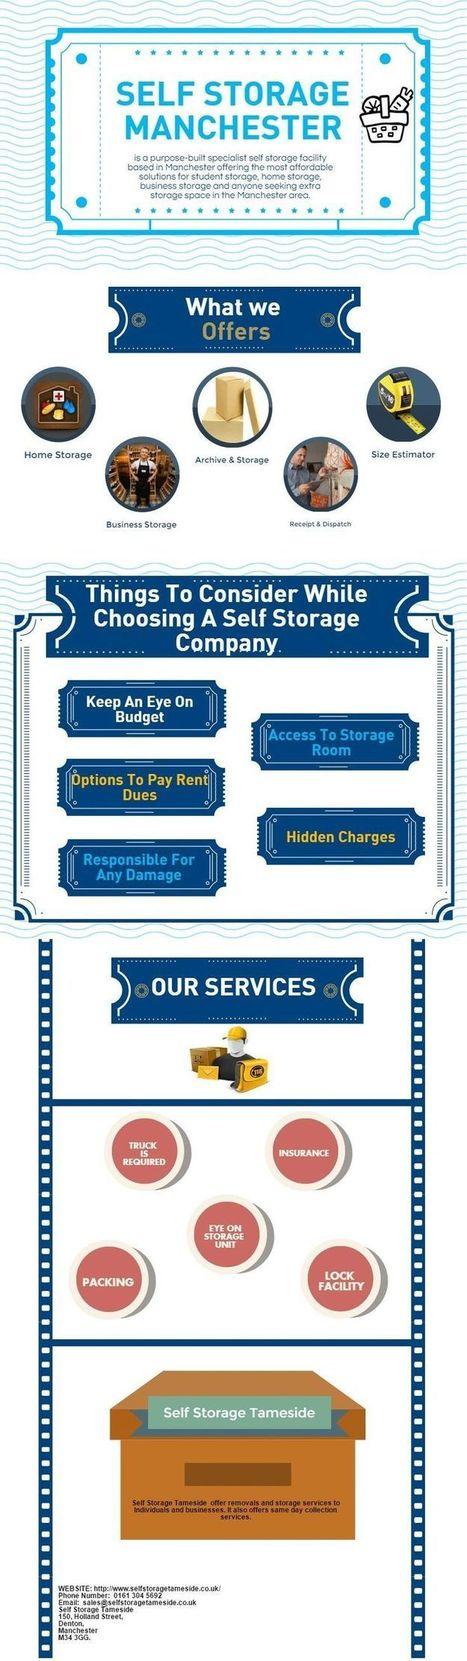 Self Storage Tameside Company   Selfstorage Tameside   Scoop.it